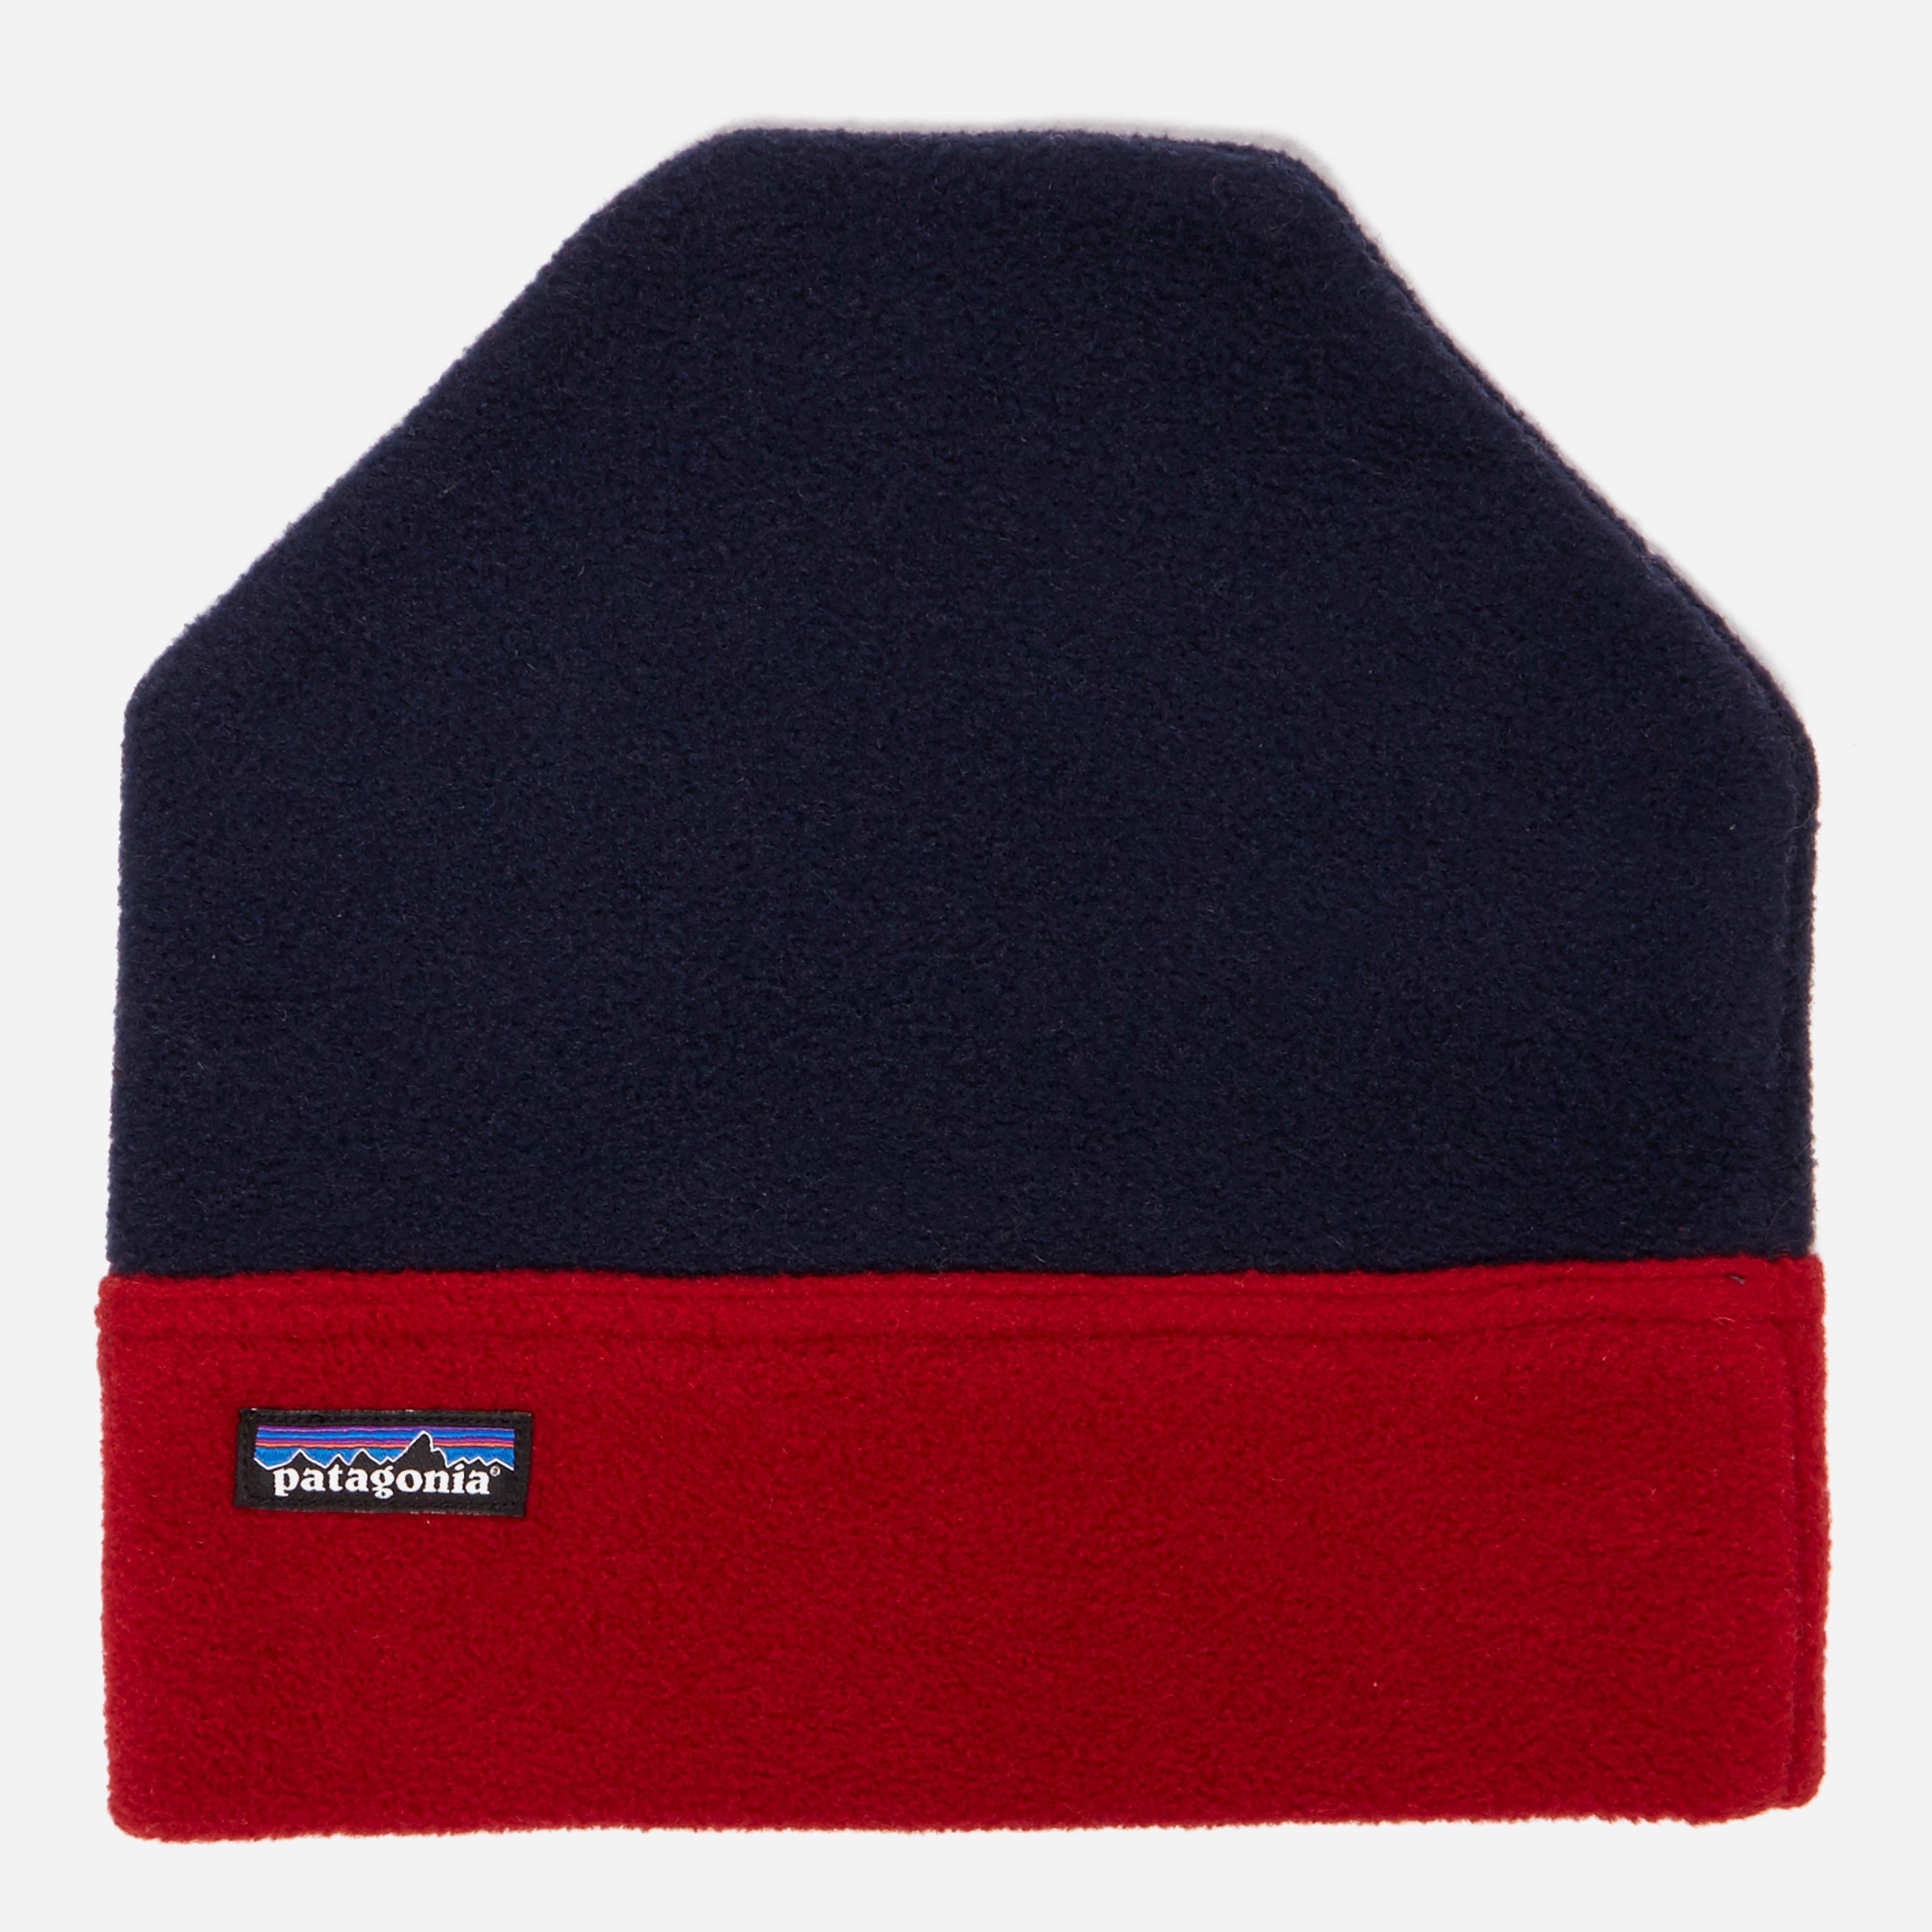 Patagonia Synch Alpine Hat Navy Blue